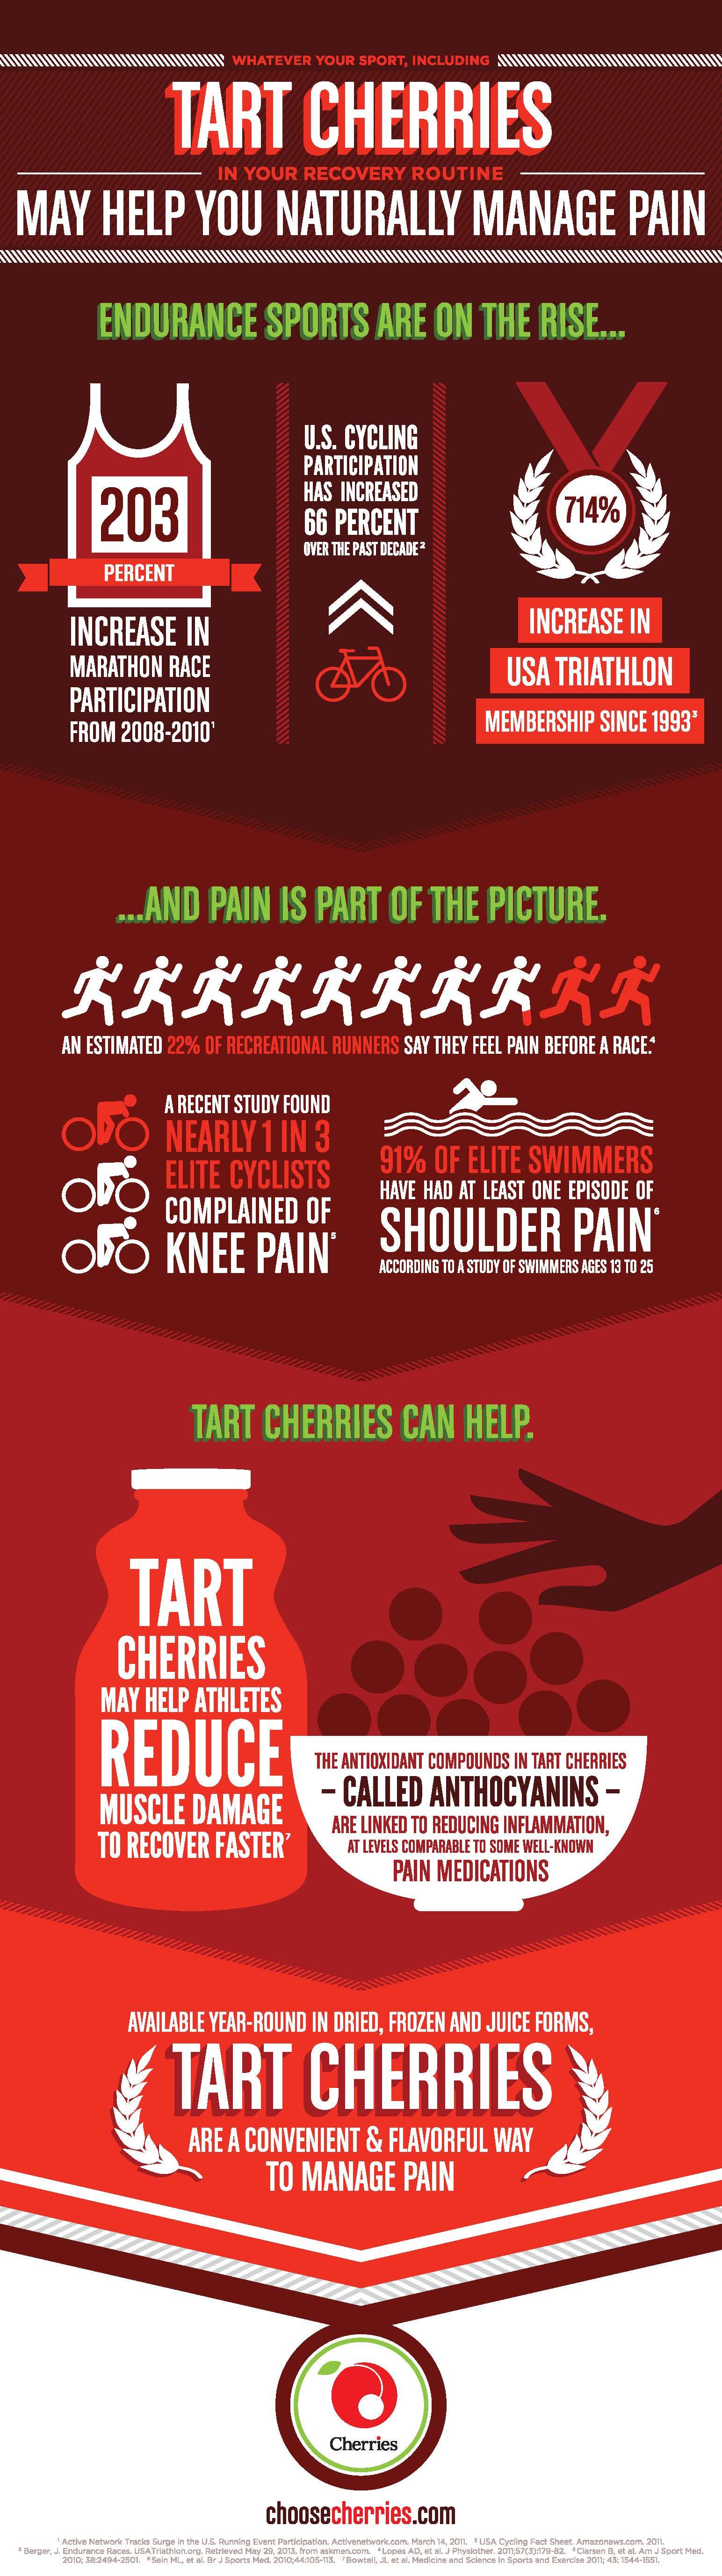 Tart Cherries and Endurance Sports - Infographic